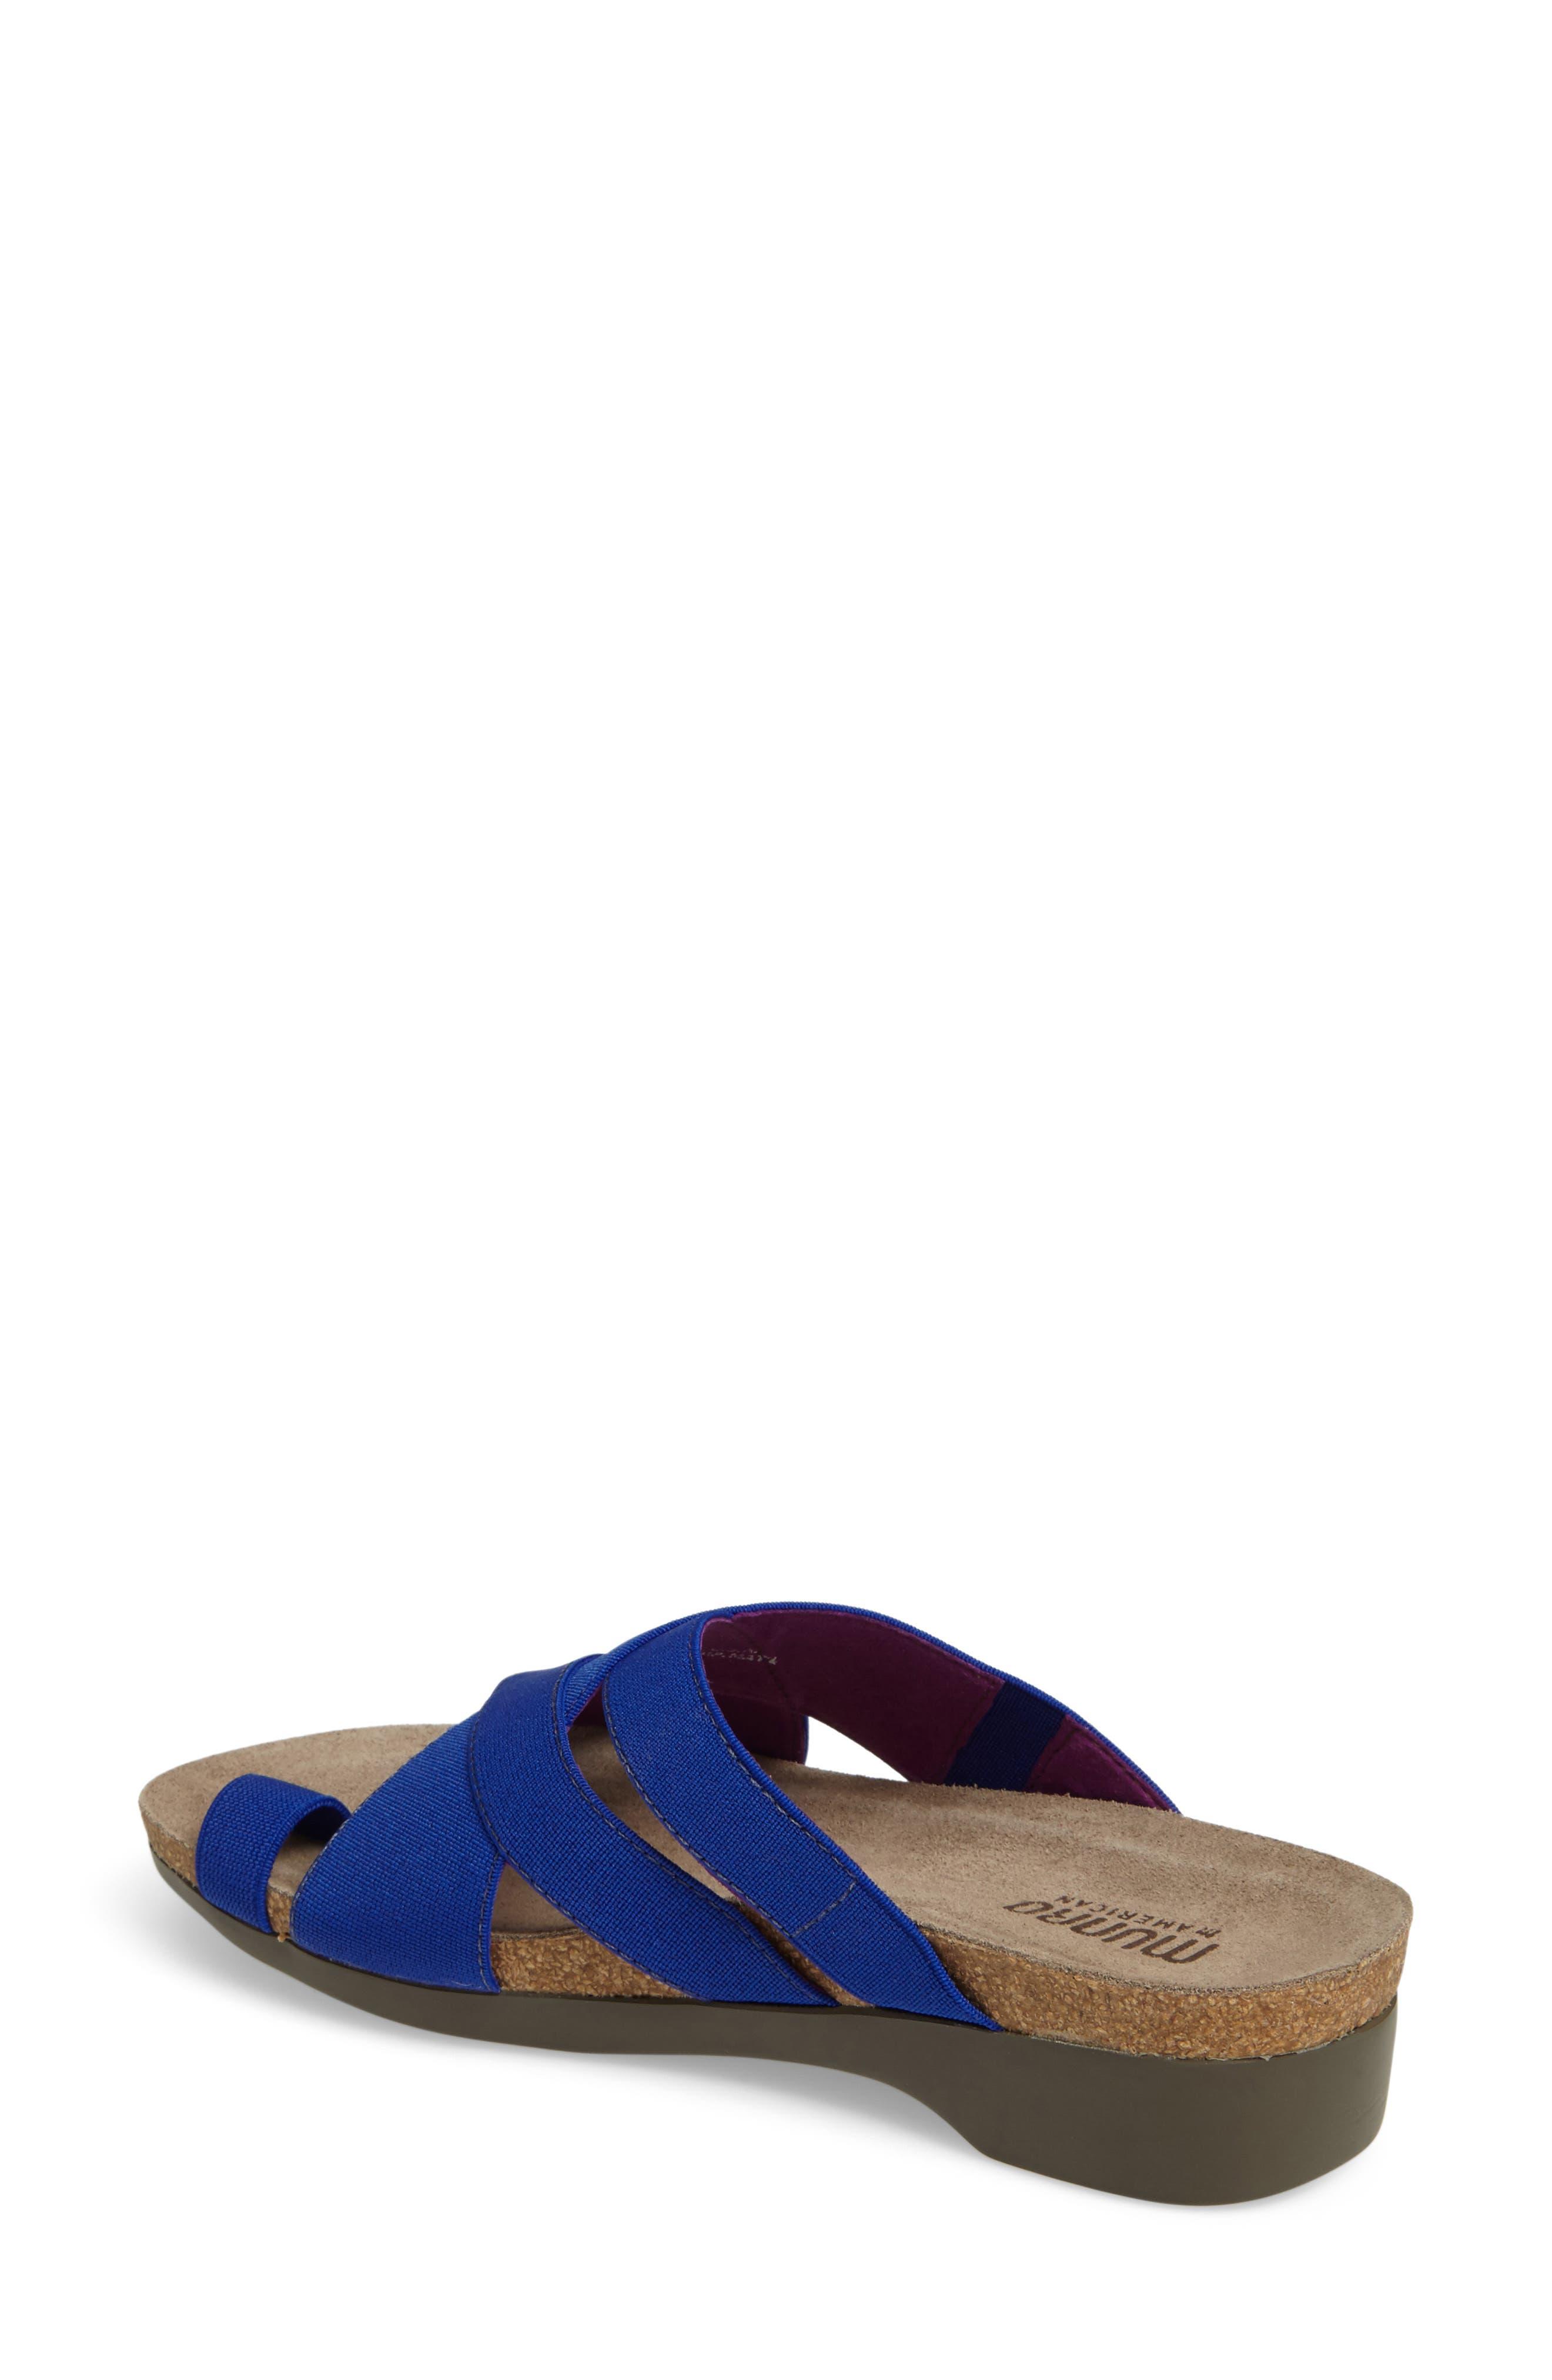 Delphi Slide Sandal,                             Alternate thumbnail 2, color,                             Blue Fabric